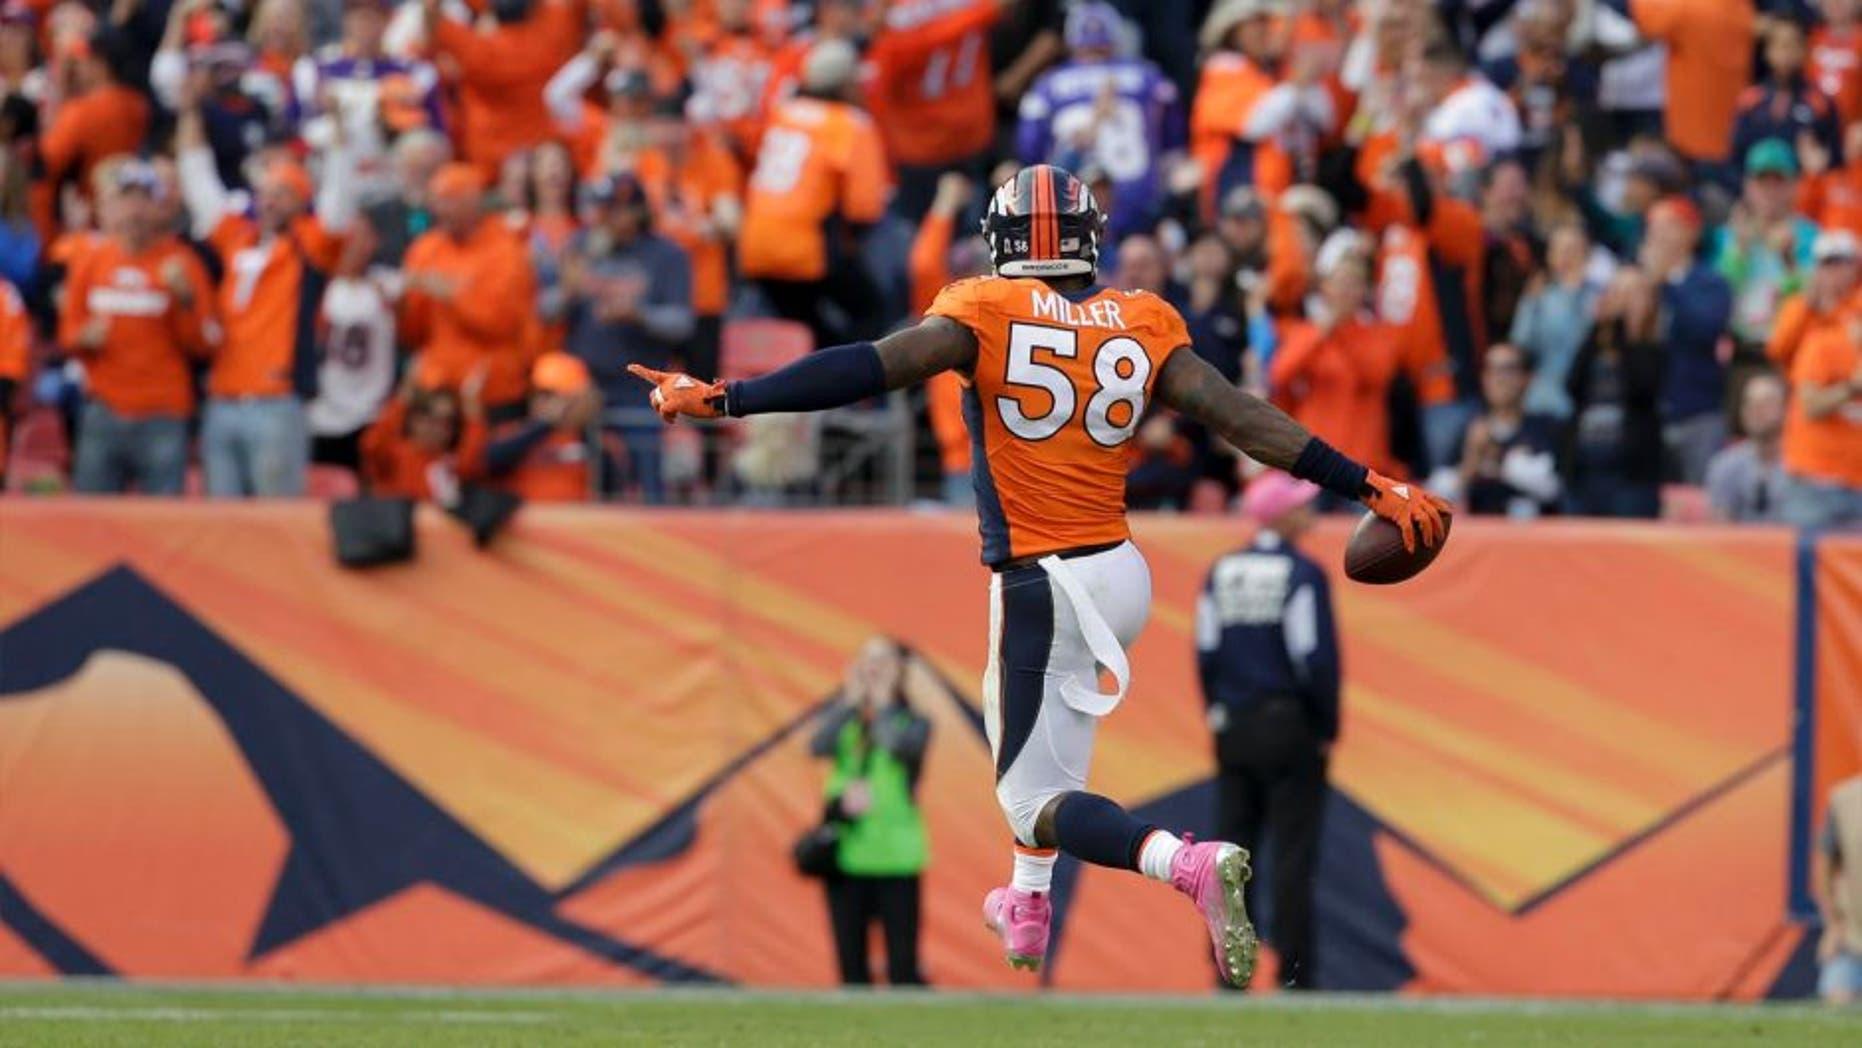 Denver Broncos outside linebacker Von Miller celebrates after sacking Minnesota Vikings quarterback Teddy Bridgewater during the second half in Denver on Sunday, Oct. 4, 2015.